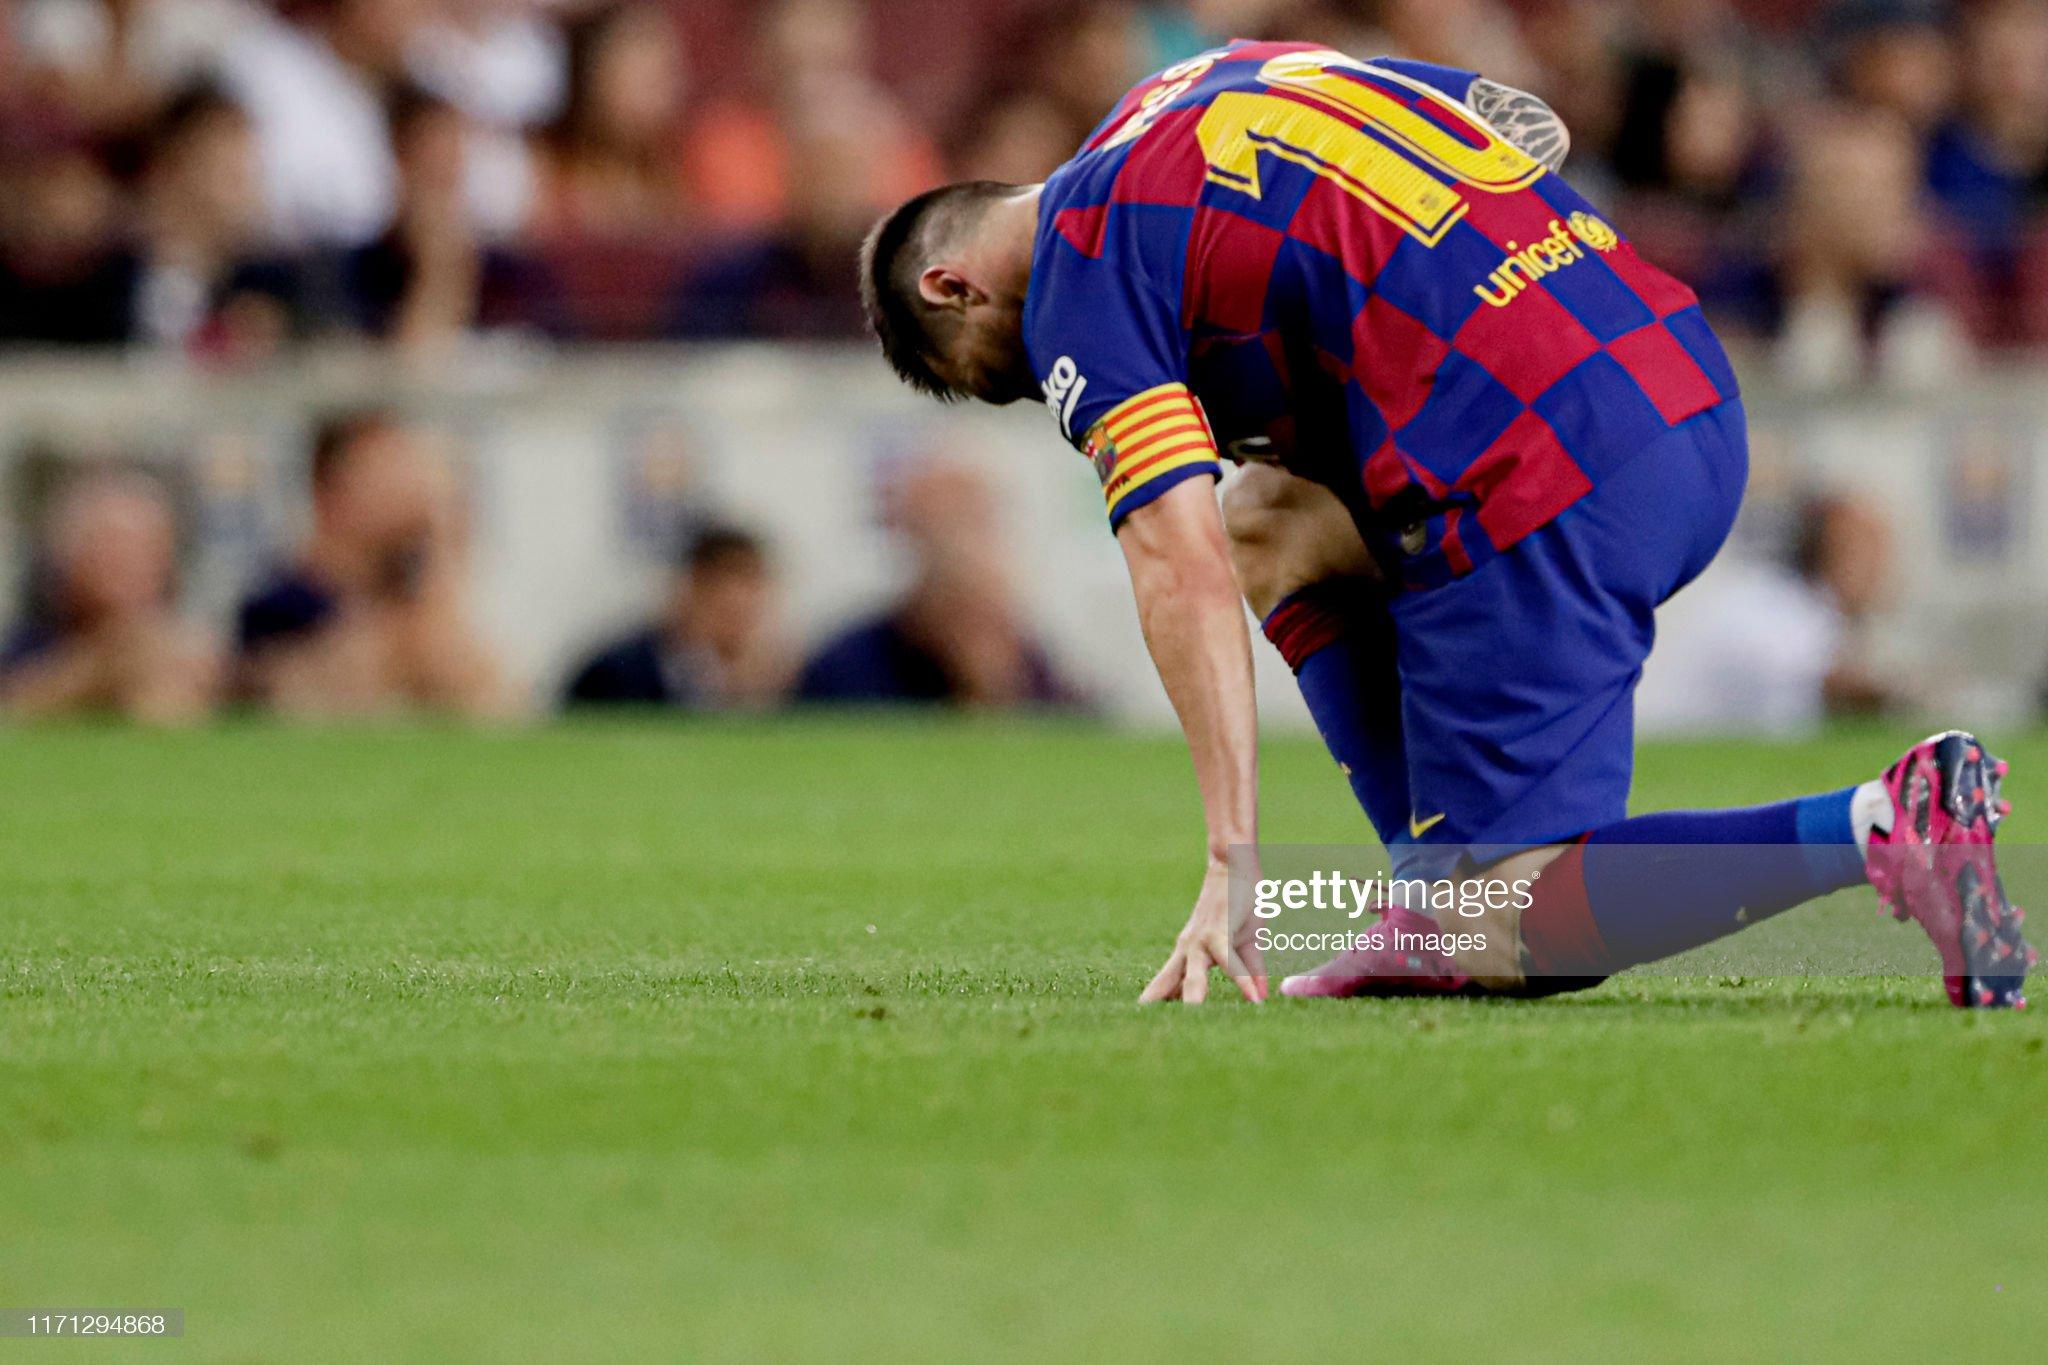 صور مباراة : برشلونة - فياريال 2-1 ( 24-09-2019 )  Lionel-messi-of-fc-barcelona-during-the-la-liga-santander-match-fc-picture-id1171294868?s=2048x2048